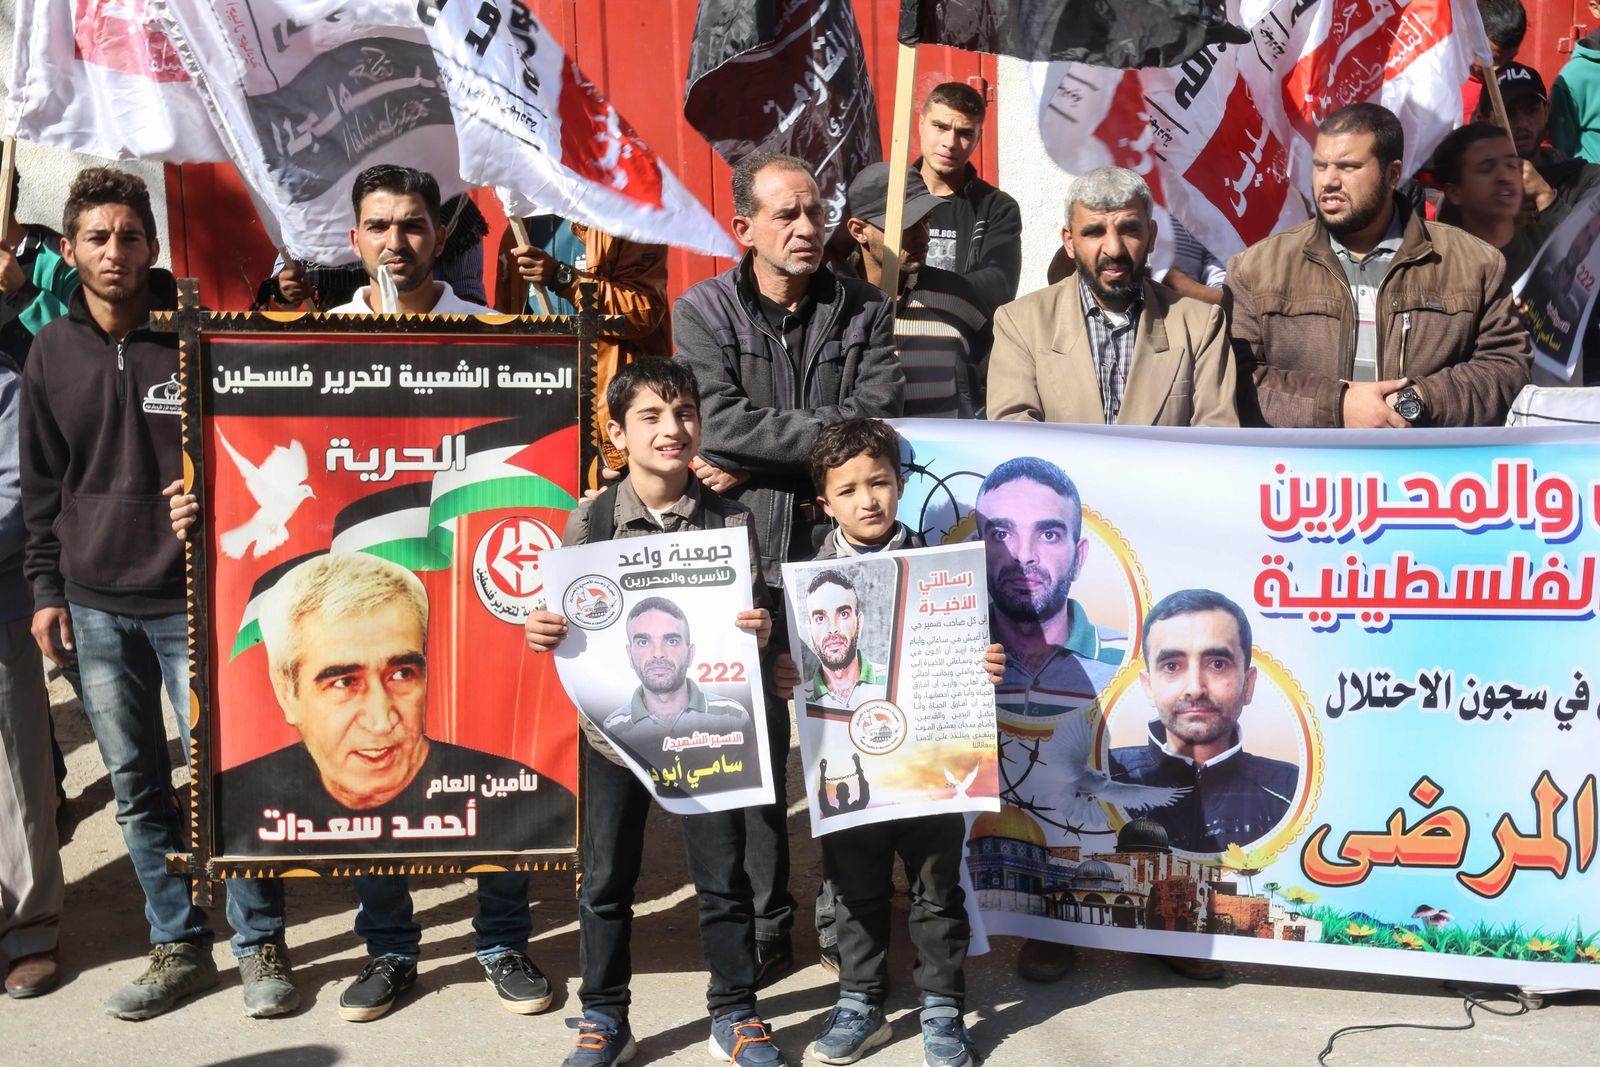 PALESTINIAN-ISRAEL-GAZA-CONFLICT-RALLY